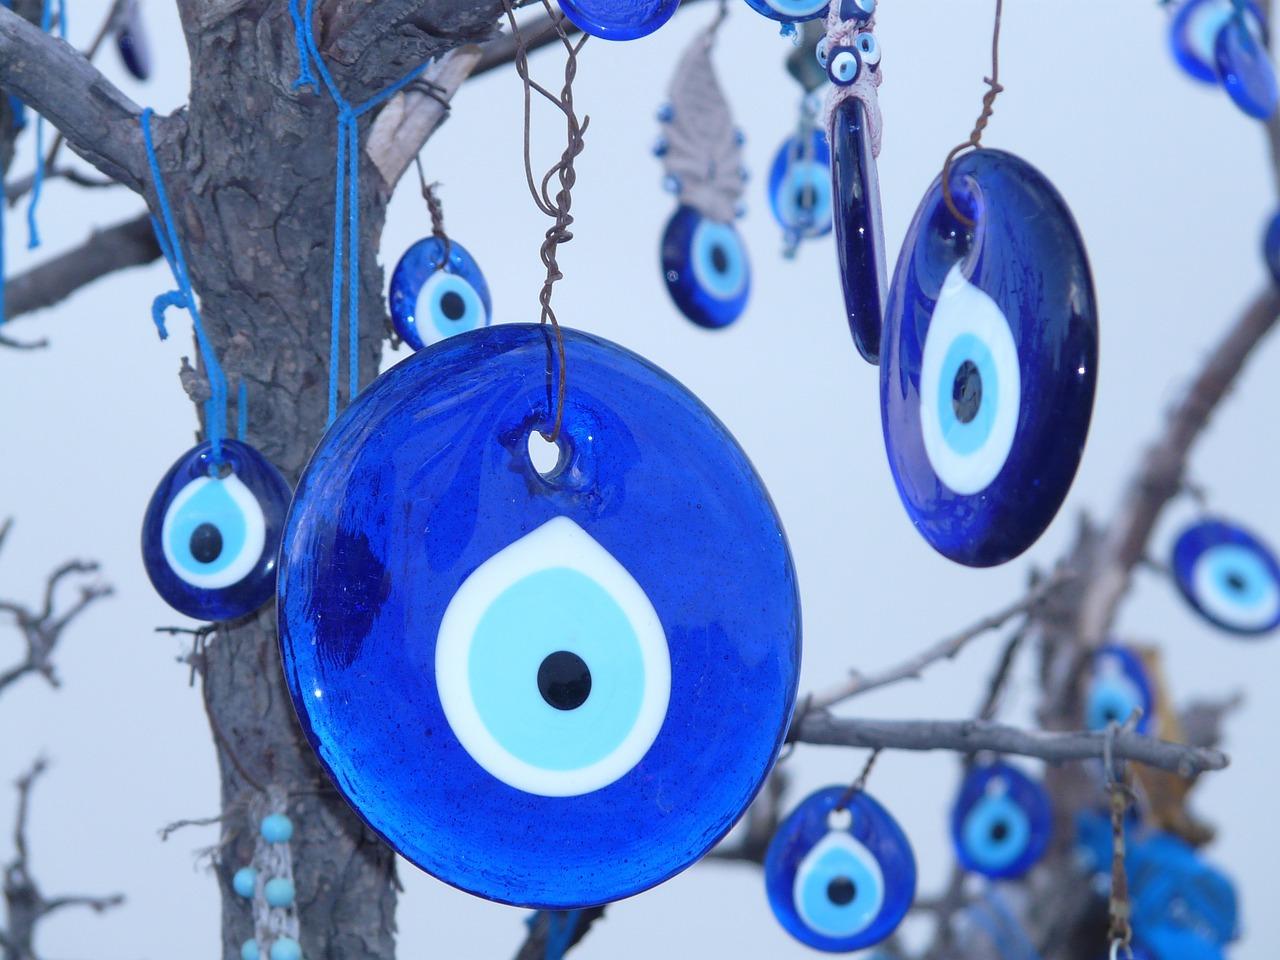 Amuleto Nazar o piedra contra el mal de ojo. Foto: Pixabay